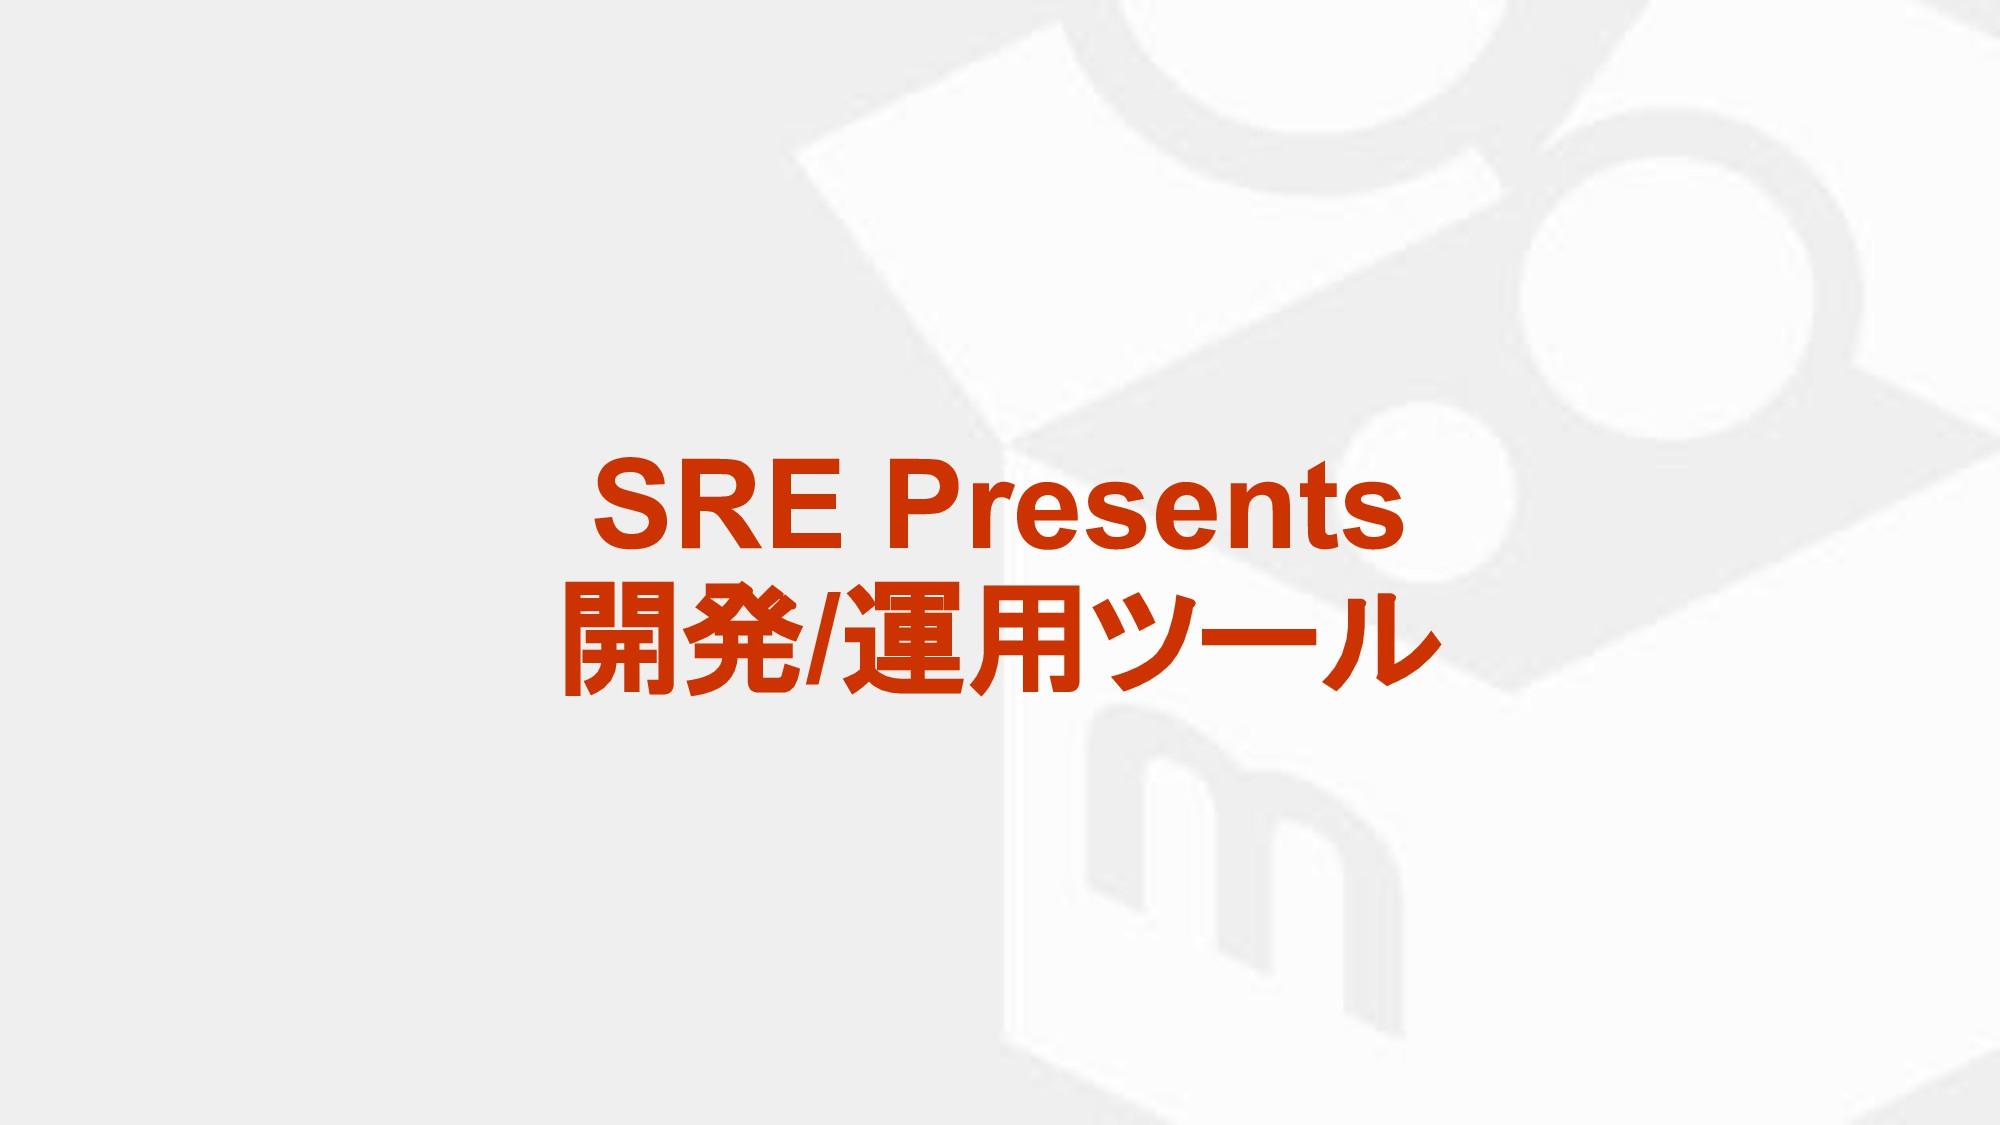 SRE Presents 開発/運用ツール